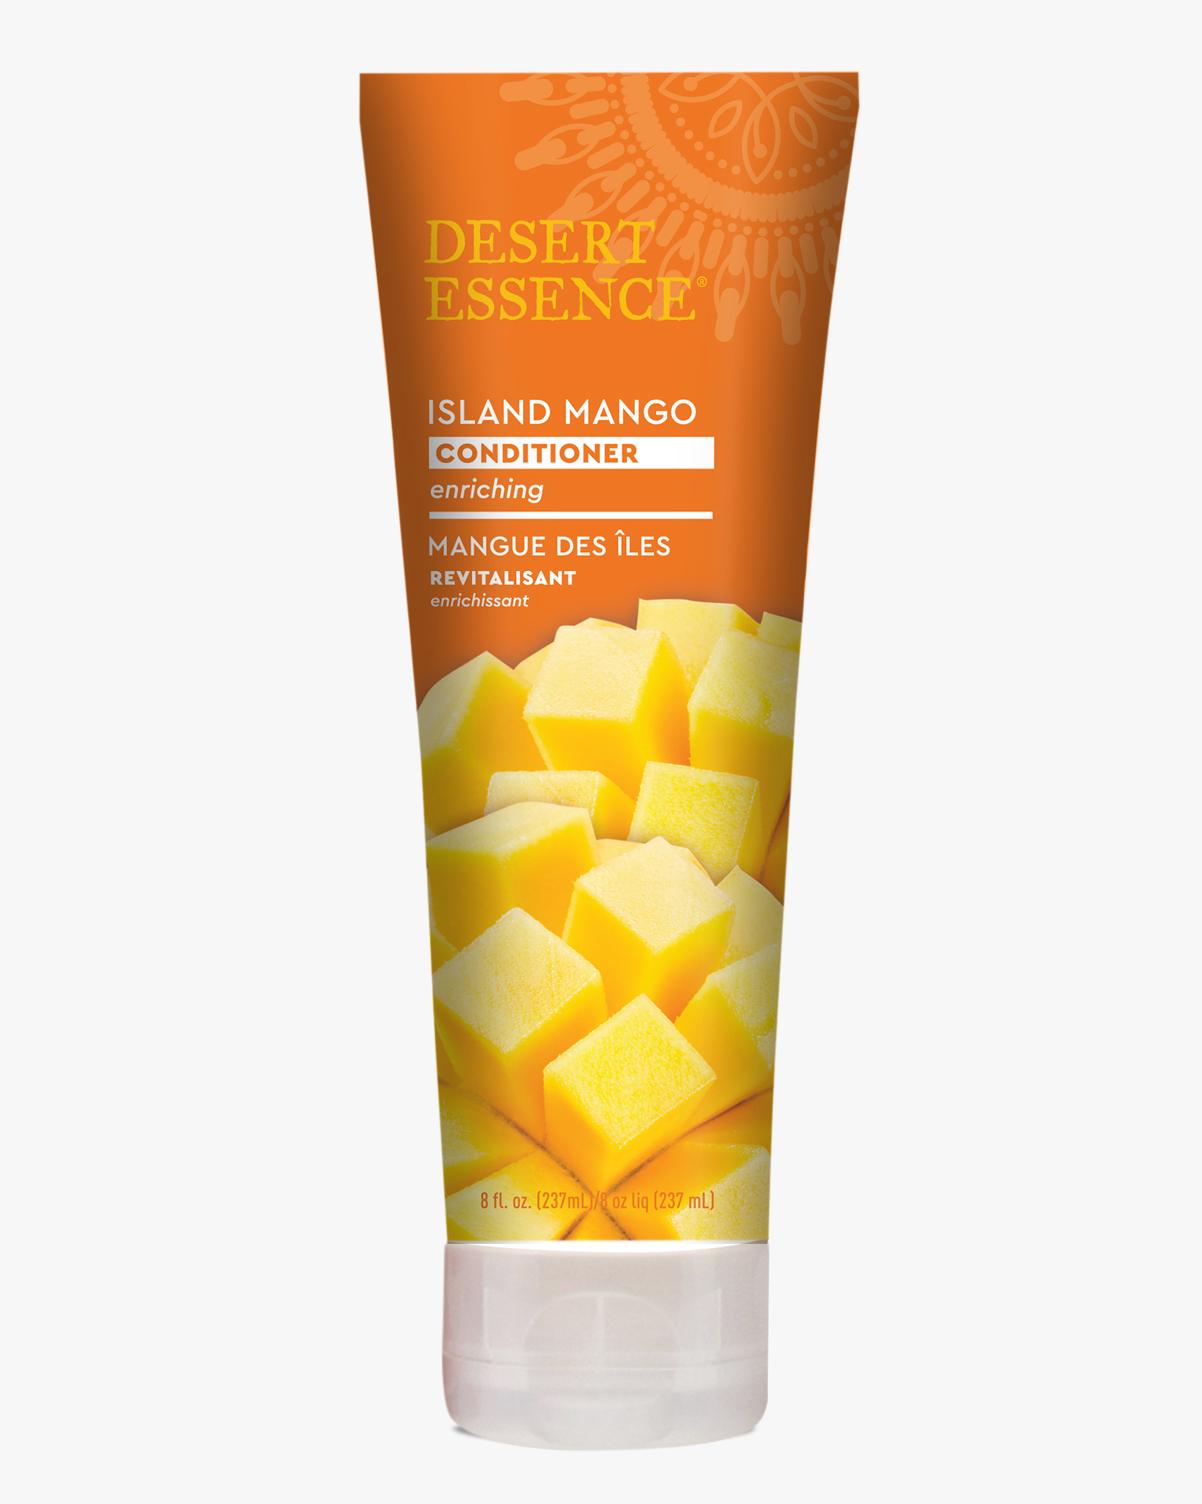 Desert Essence coupon: Desert Essence Island Mango Conditioner, 8 fl. oz. | Vegan | Gluten-Free